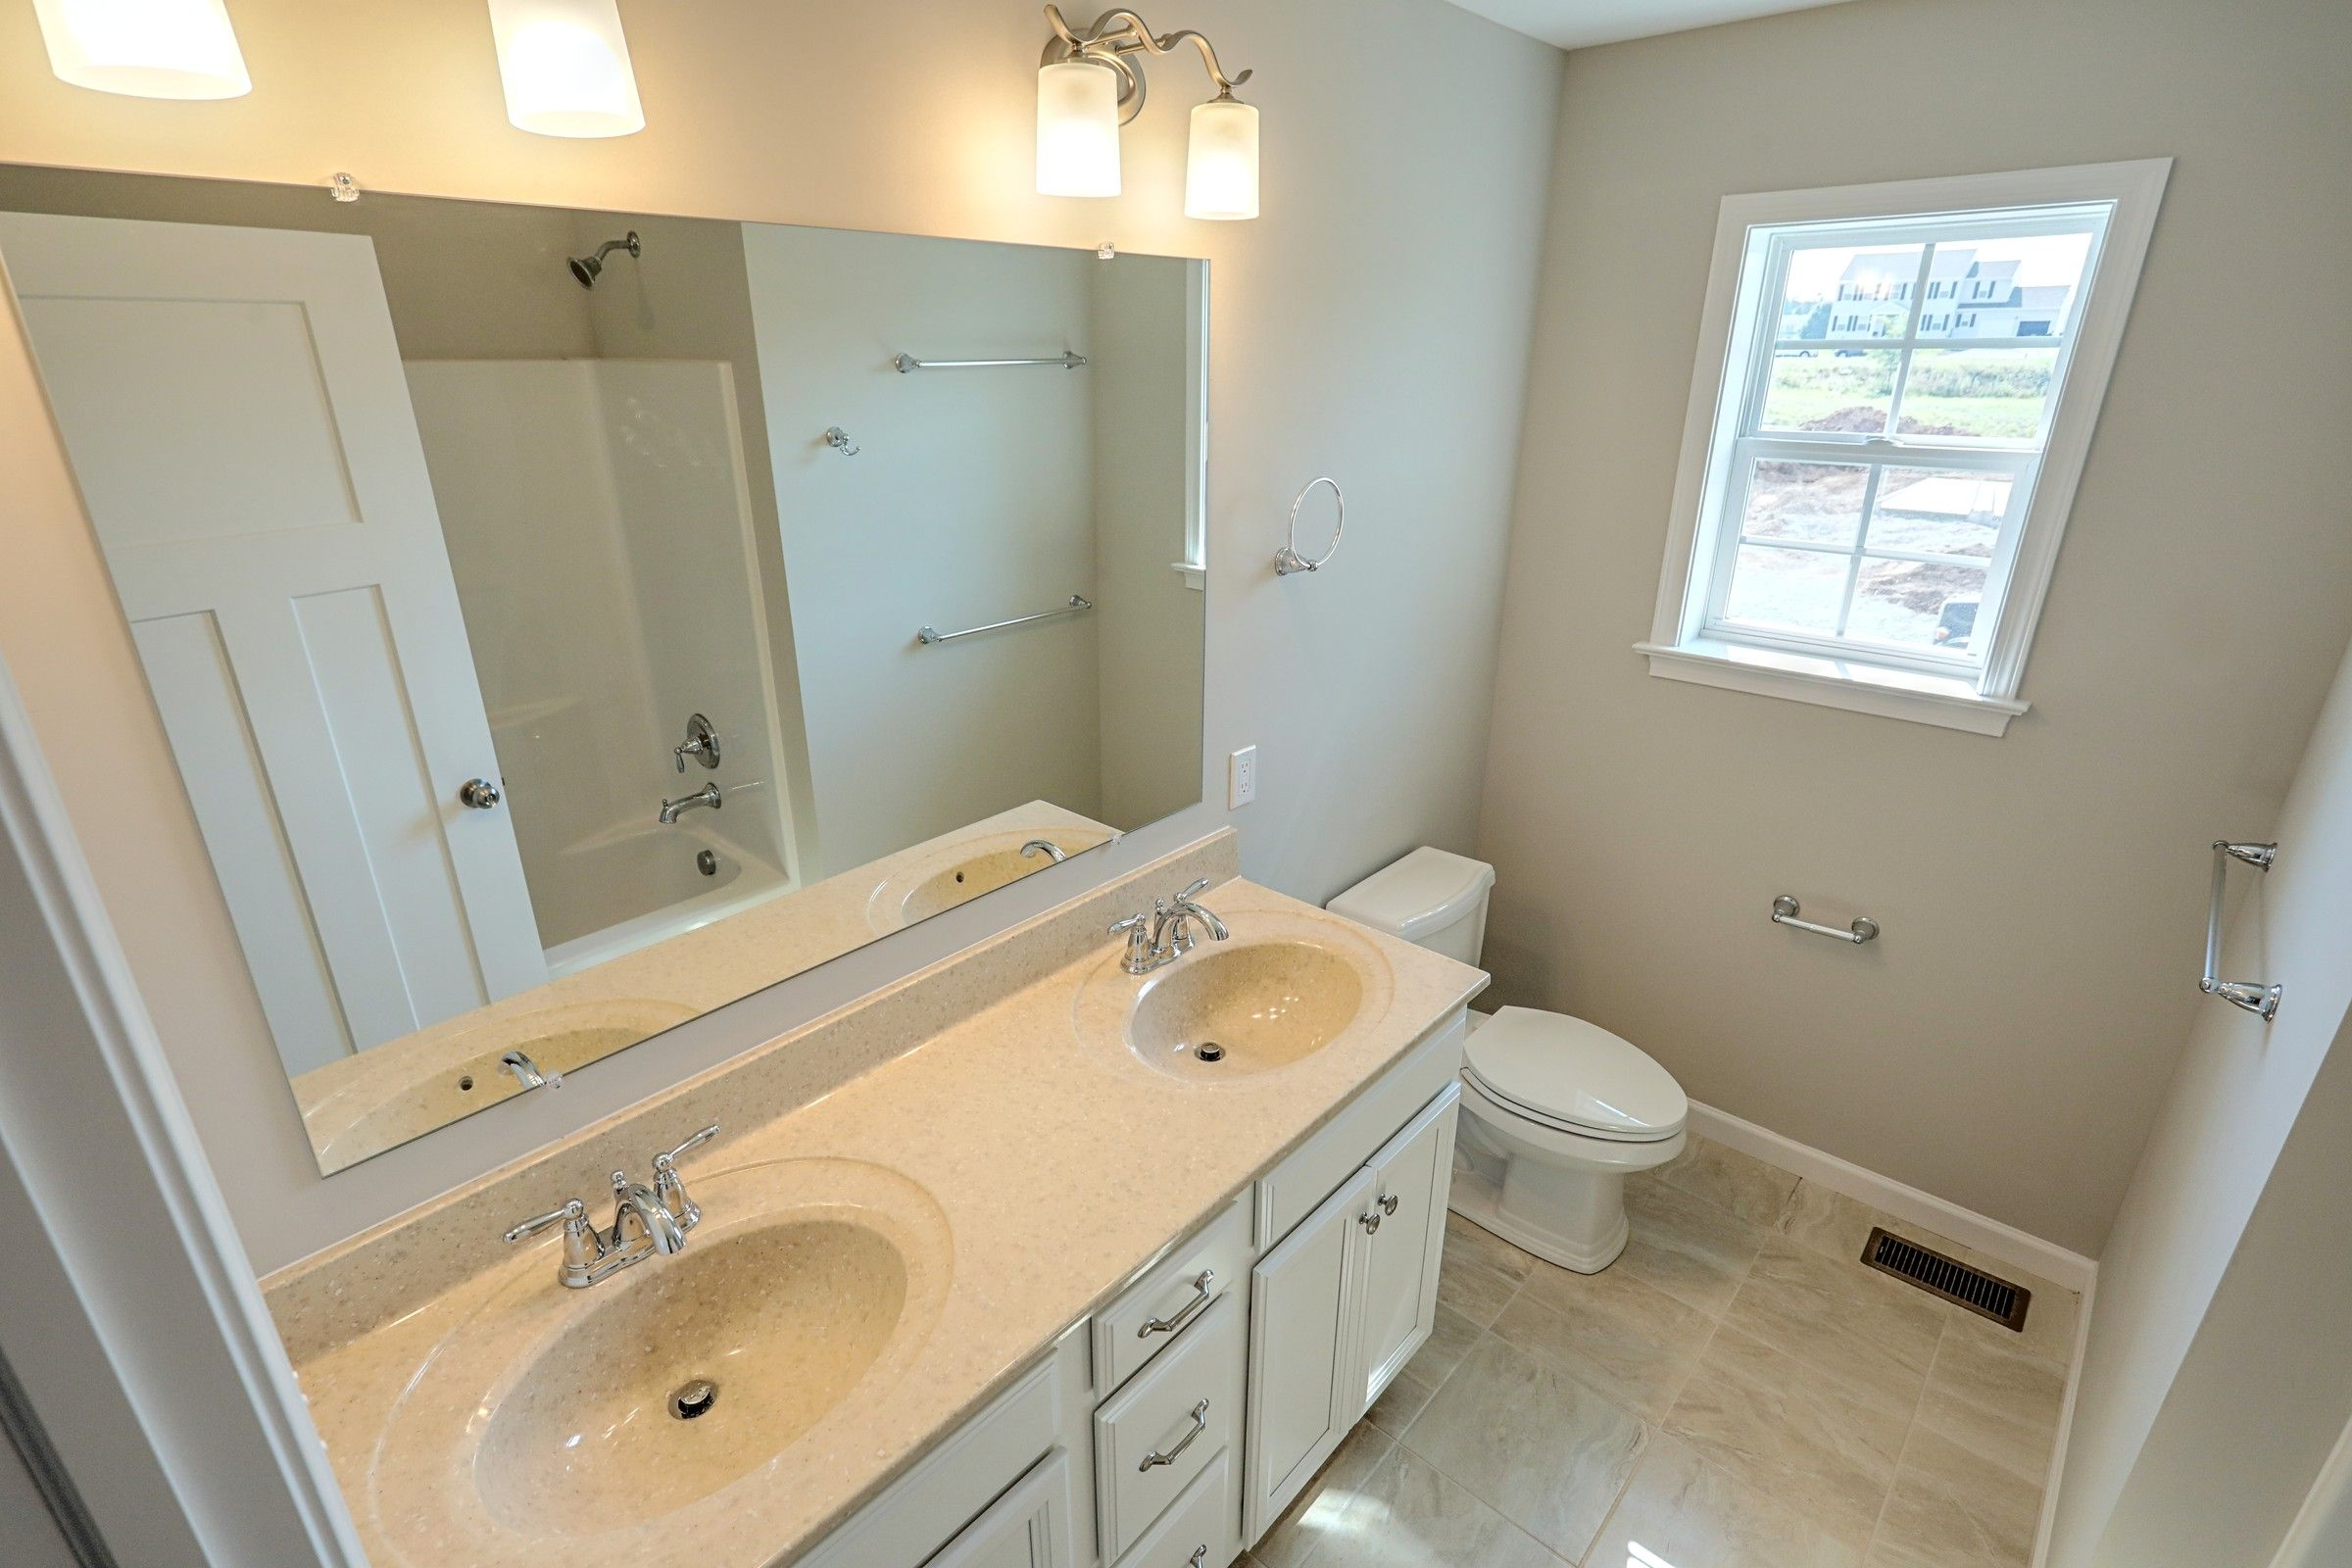 Bathroom featured in the Brentwood Heritage By Keystone Custom Homes in Philadelphia, PA